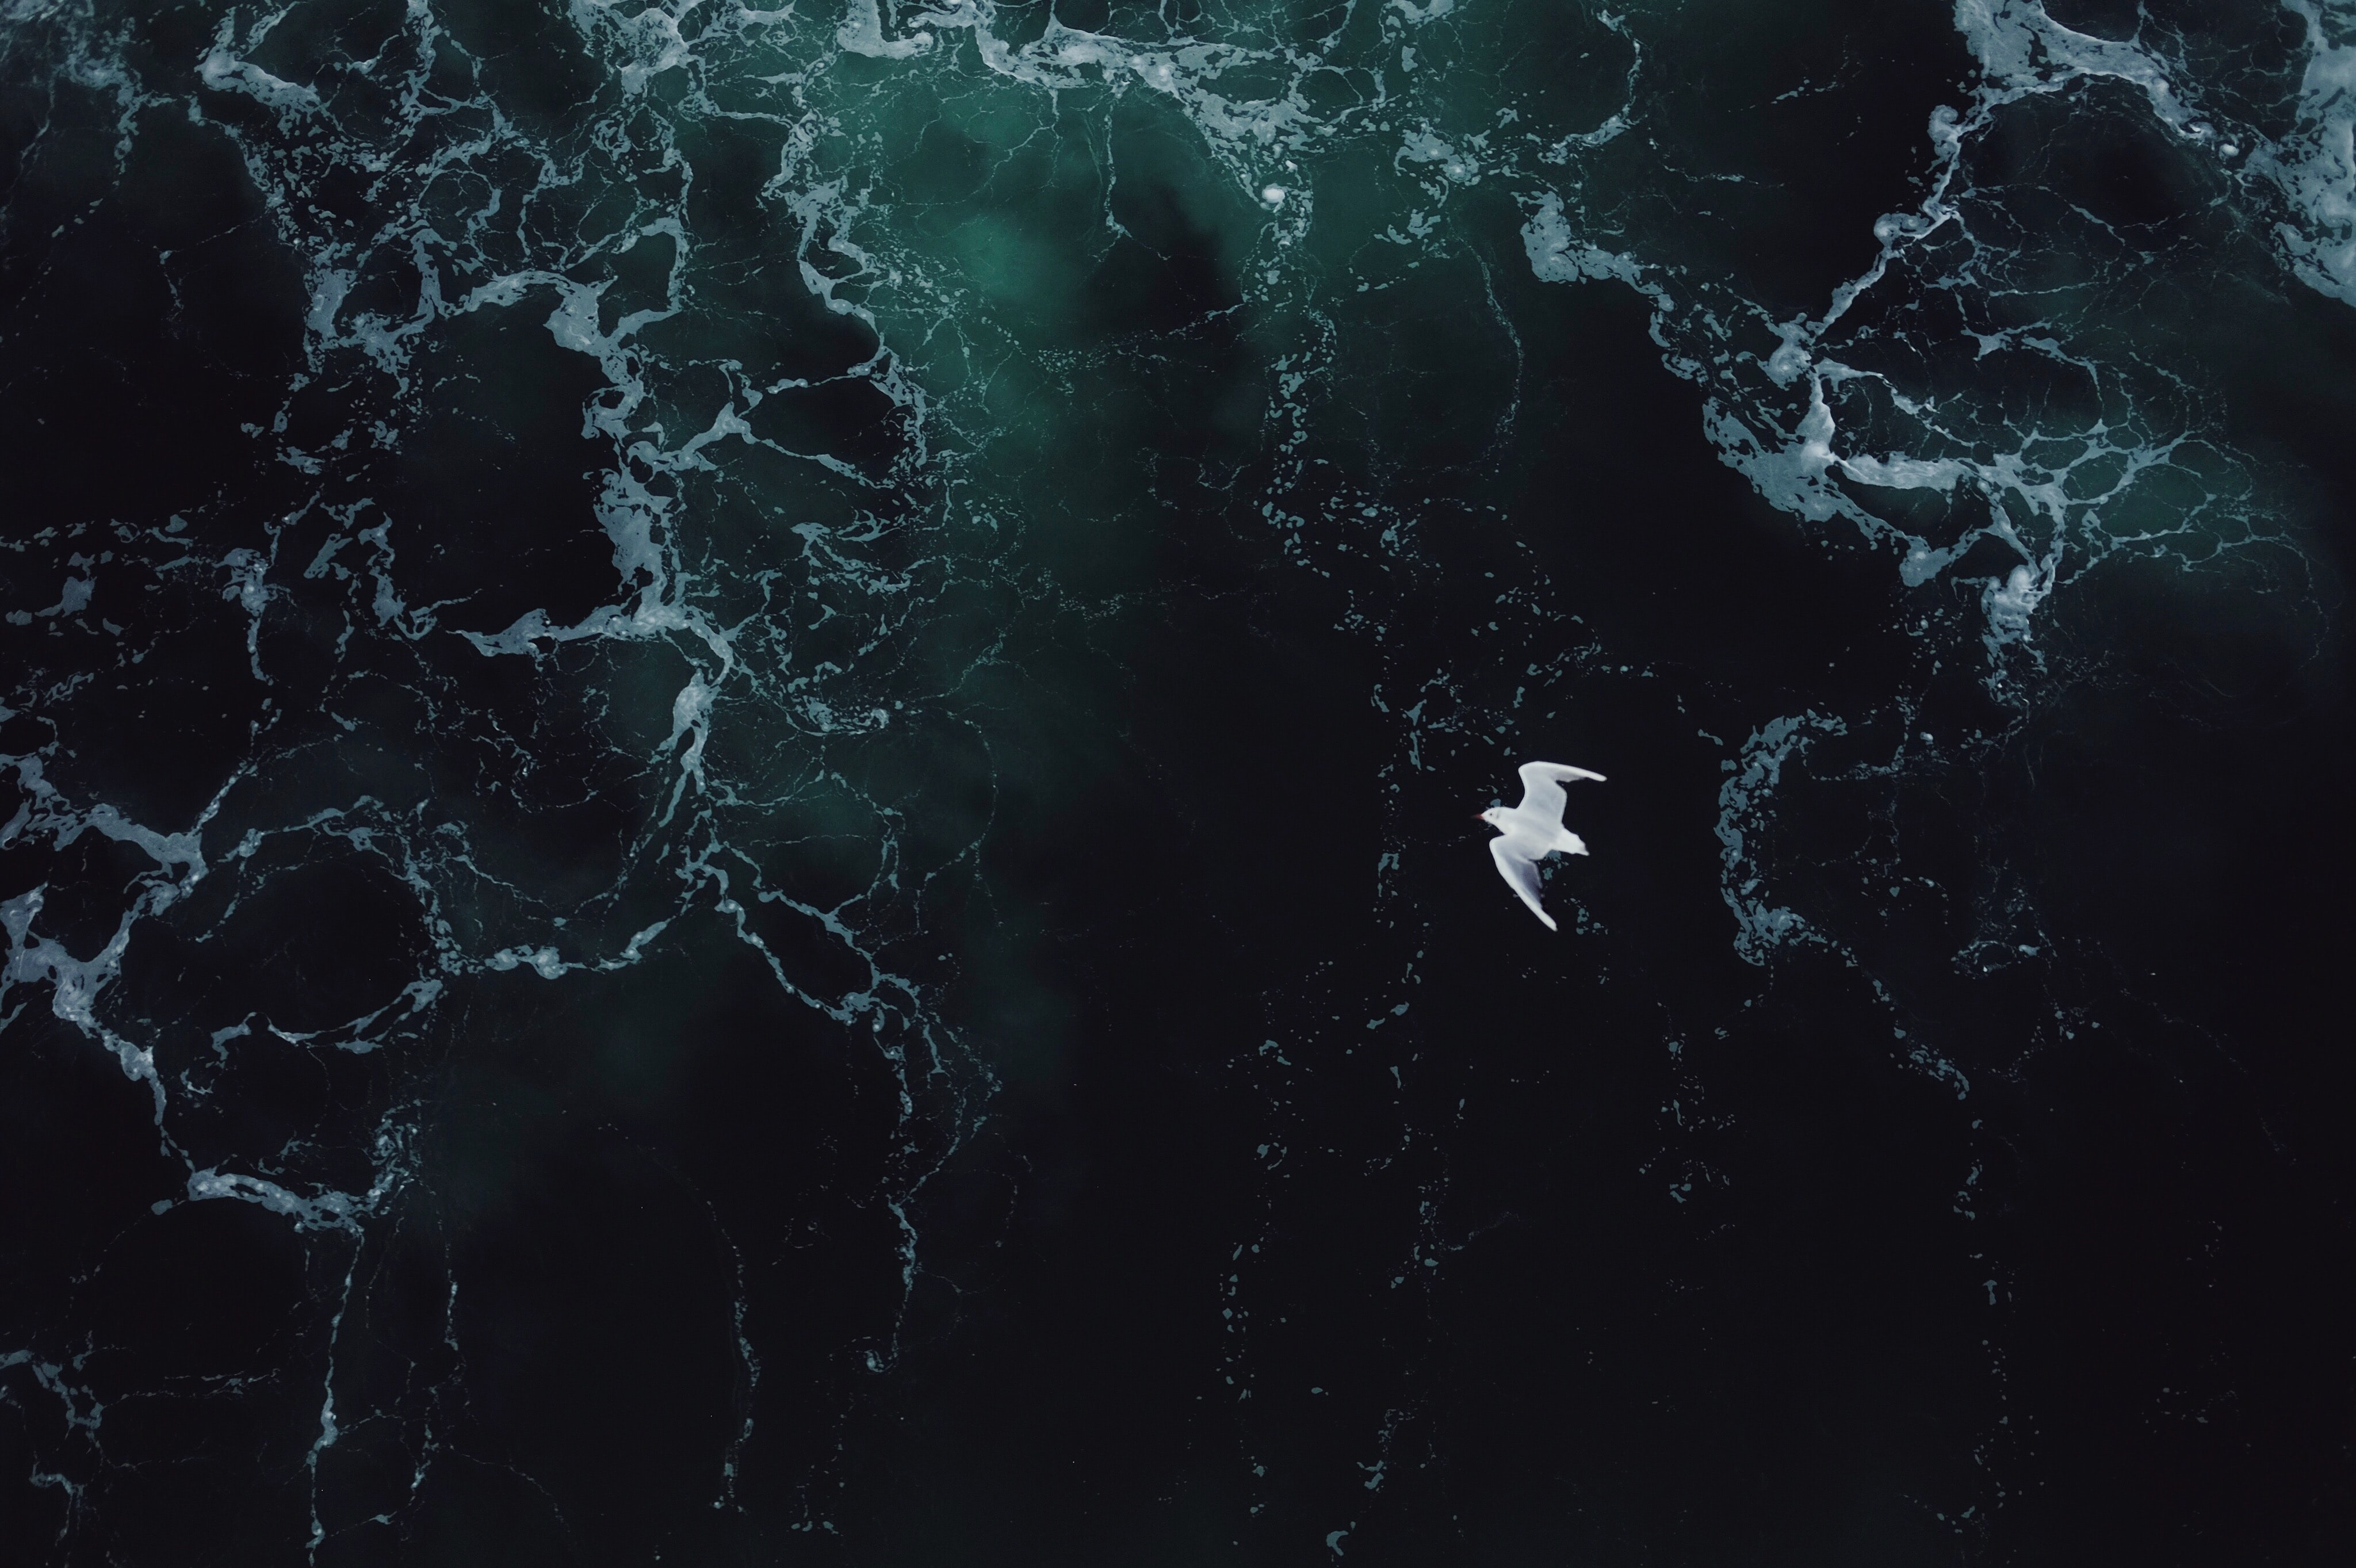 white bird flying under body of water